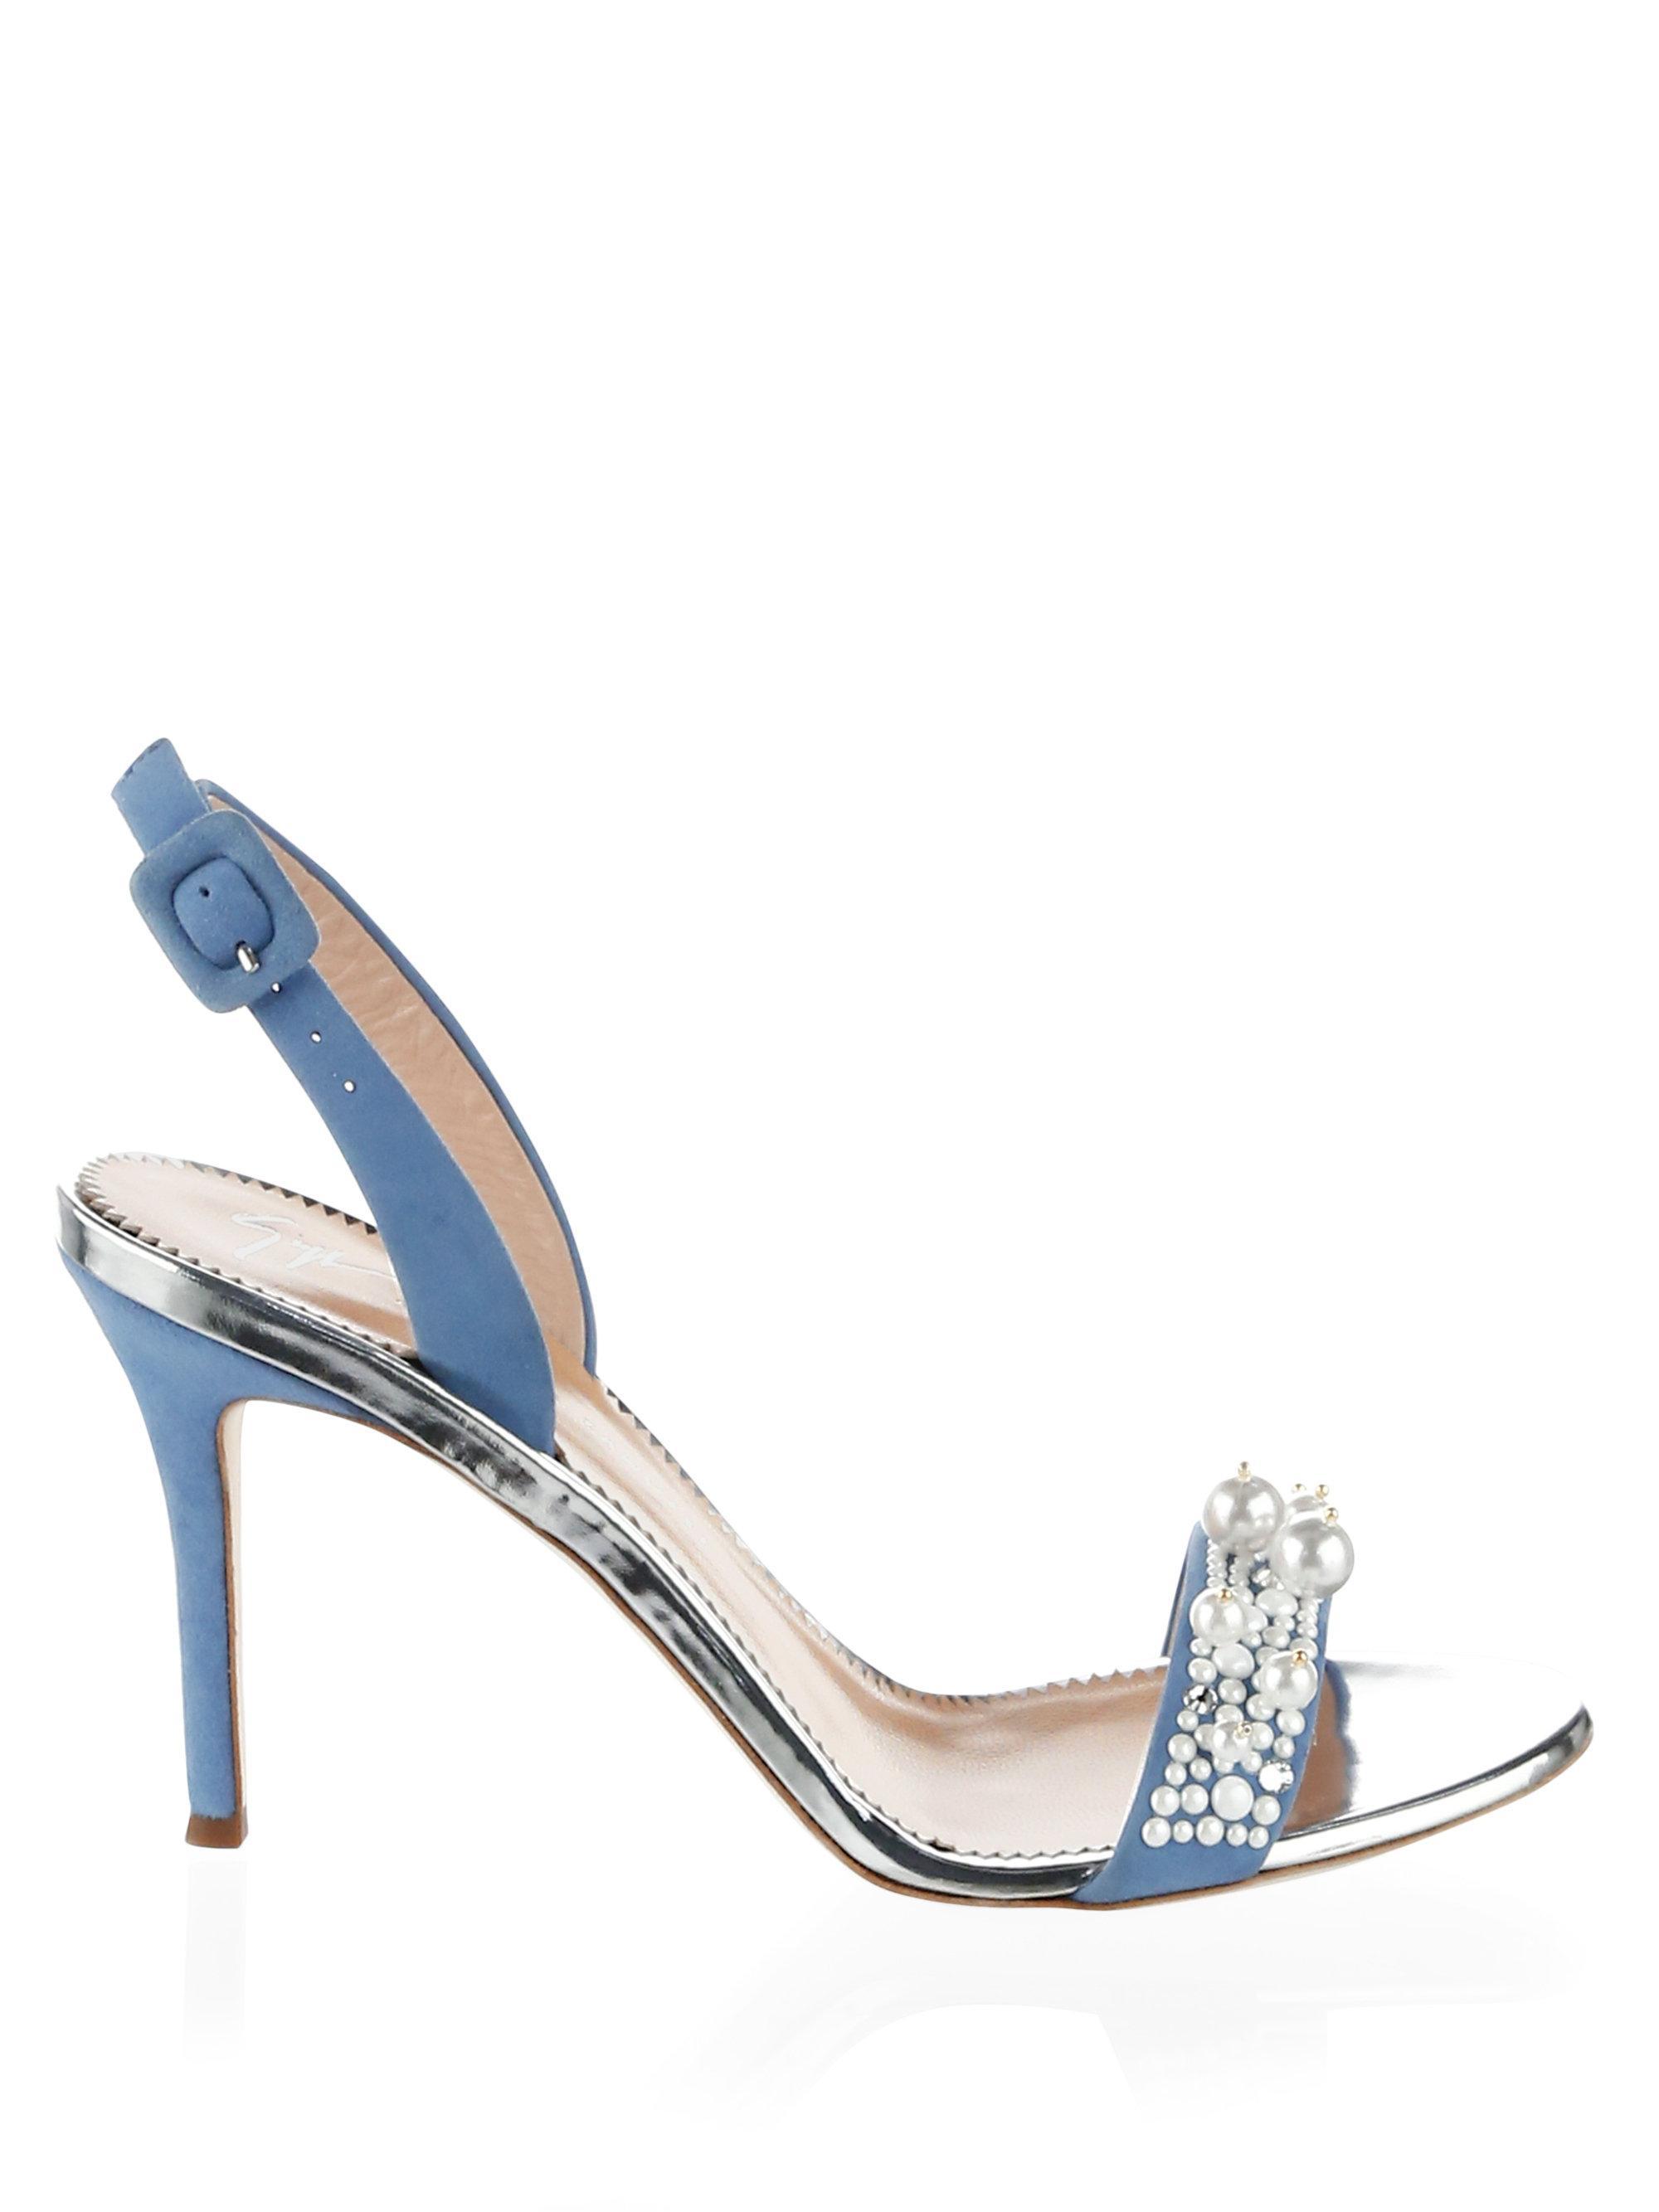 Giuseppe Zanotti Pearl embellished sling back sandals PBwpAiI5R